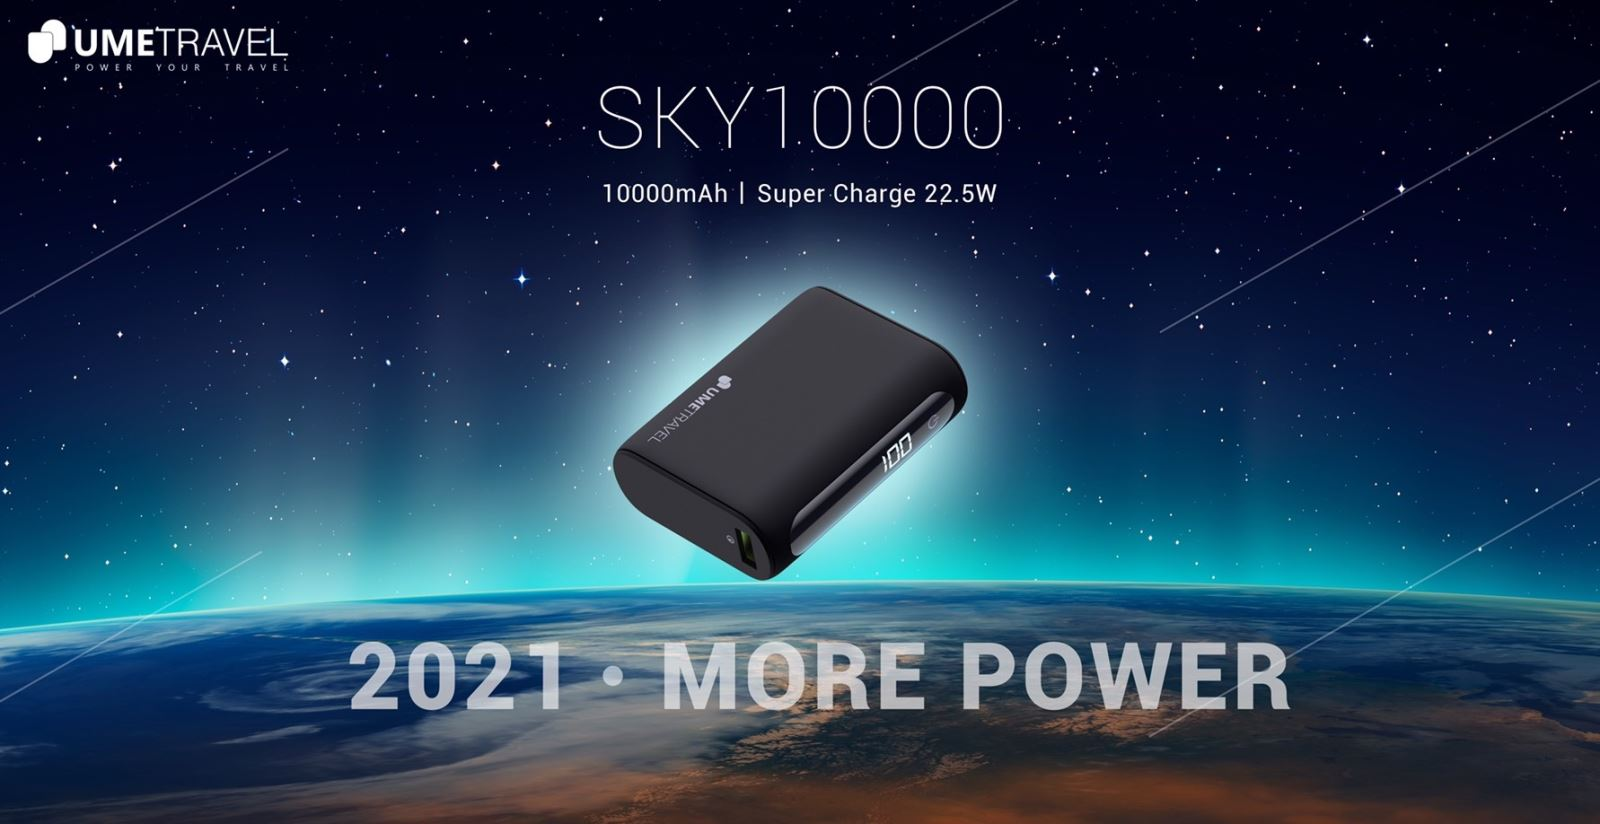 UMETRAVEL SKY10000 1